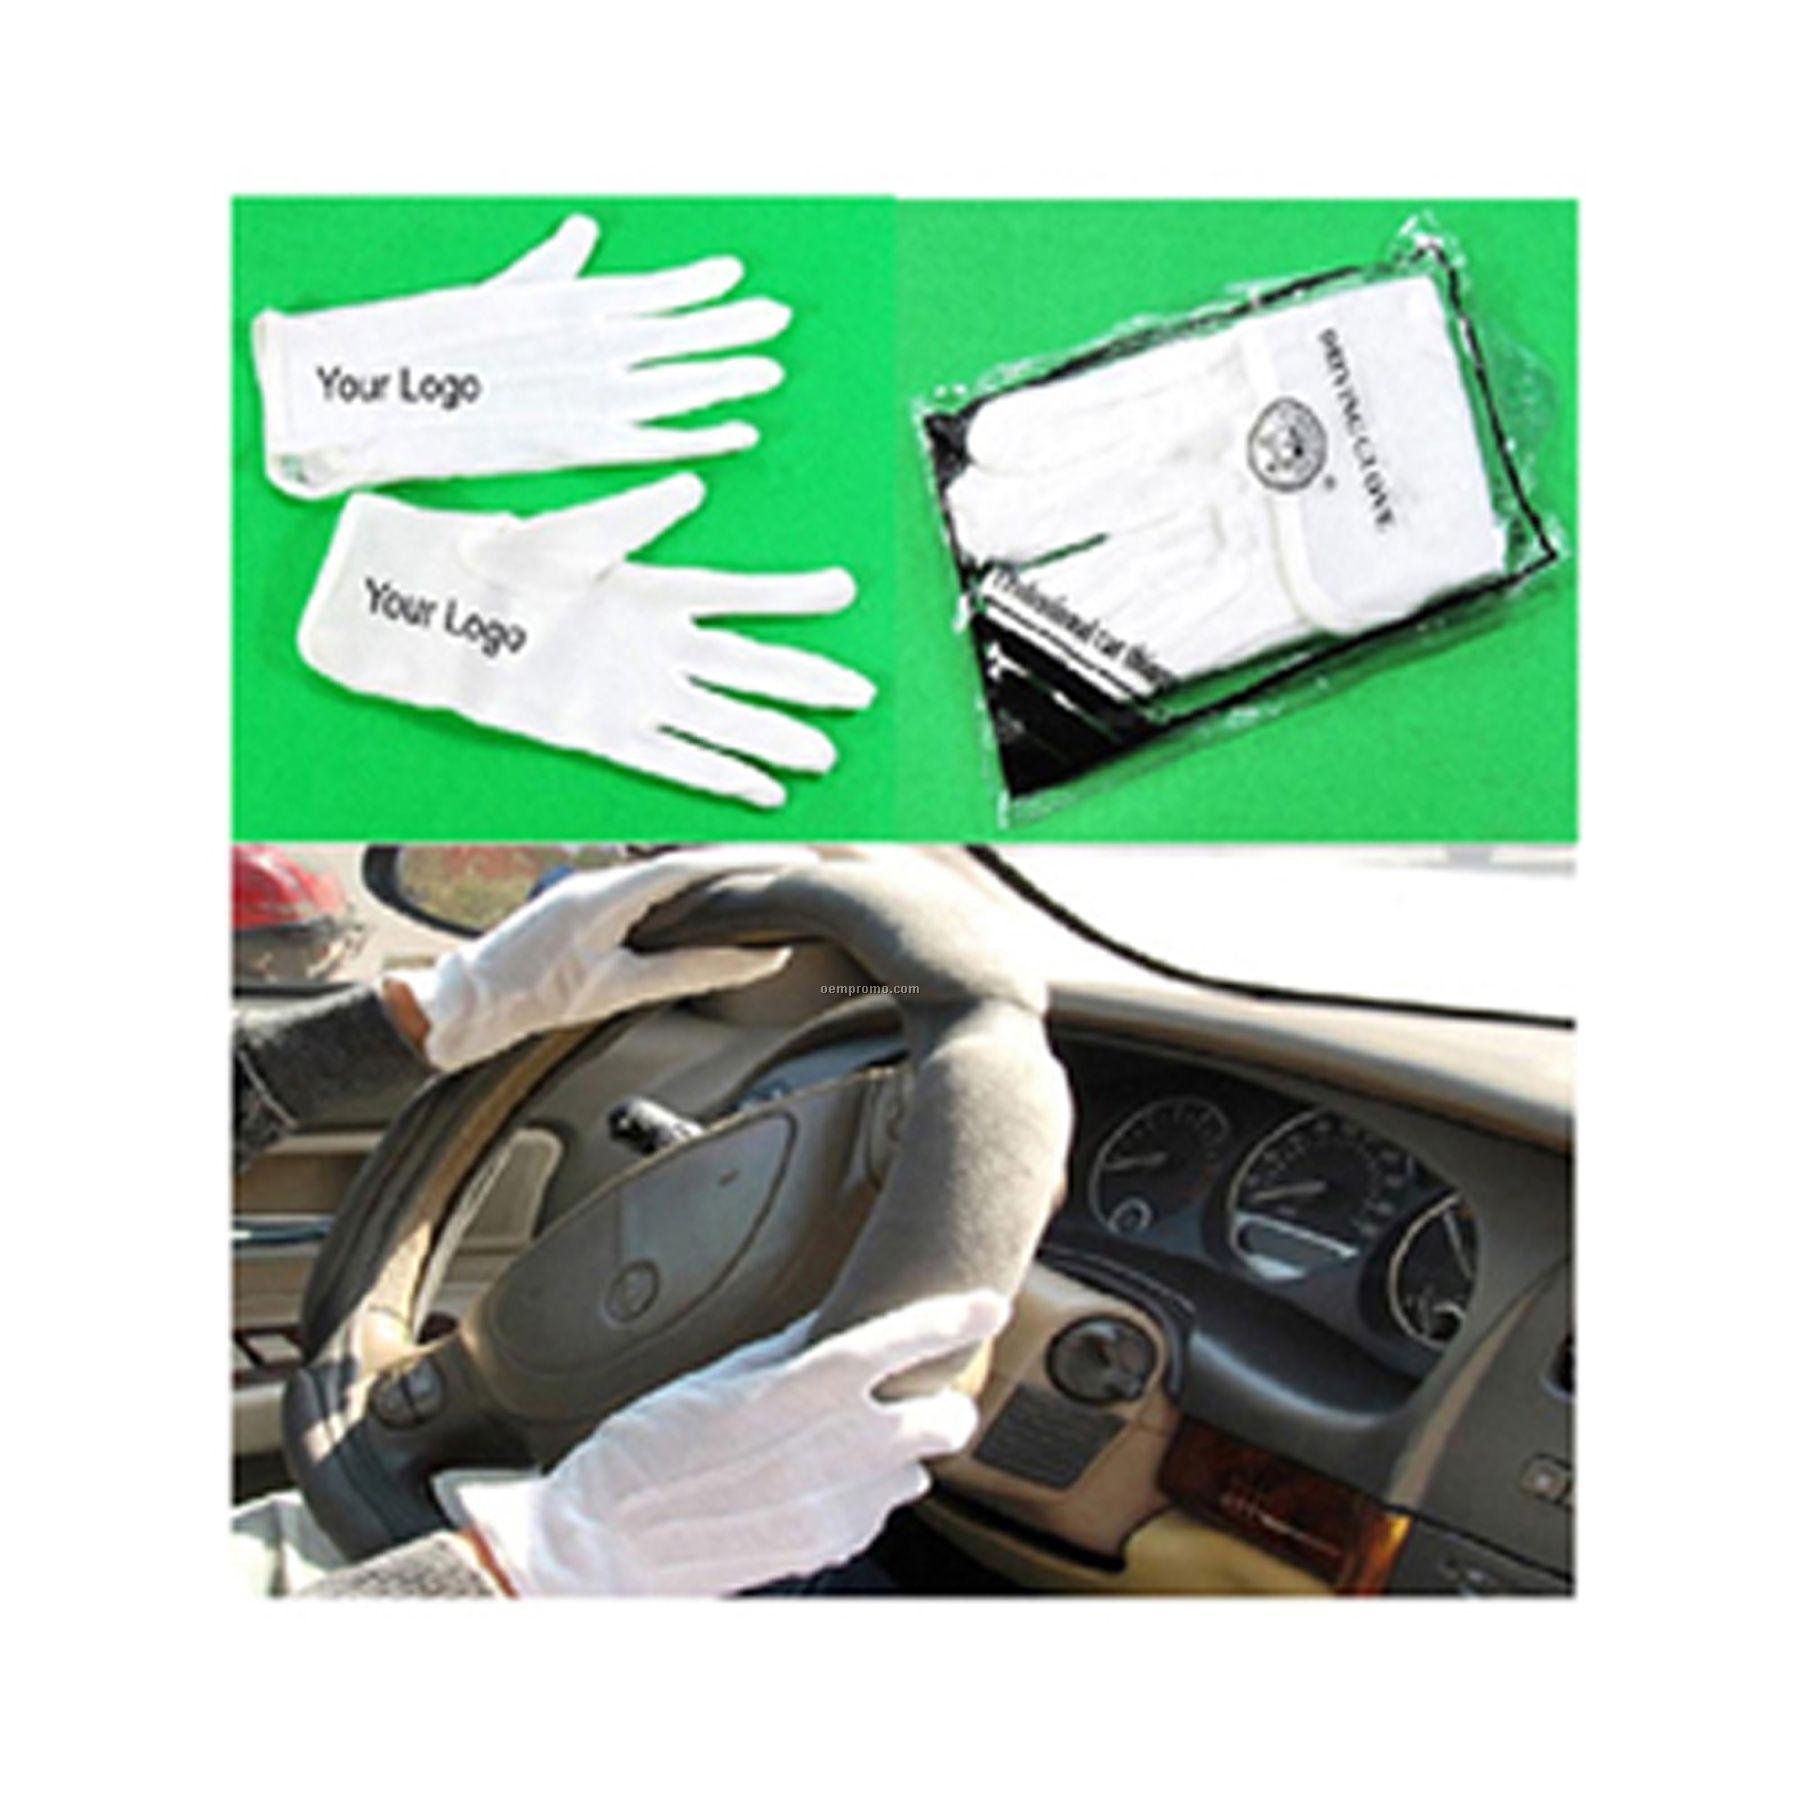 Anti-skidding Driving Glove, High Class Cop Driving Glove,Inspect Driving